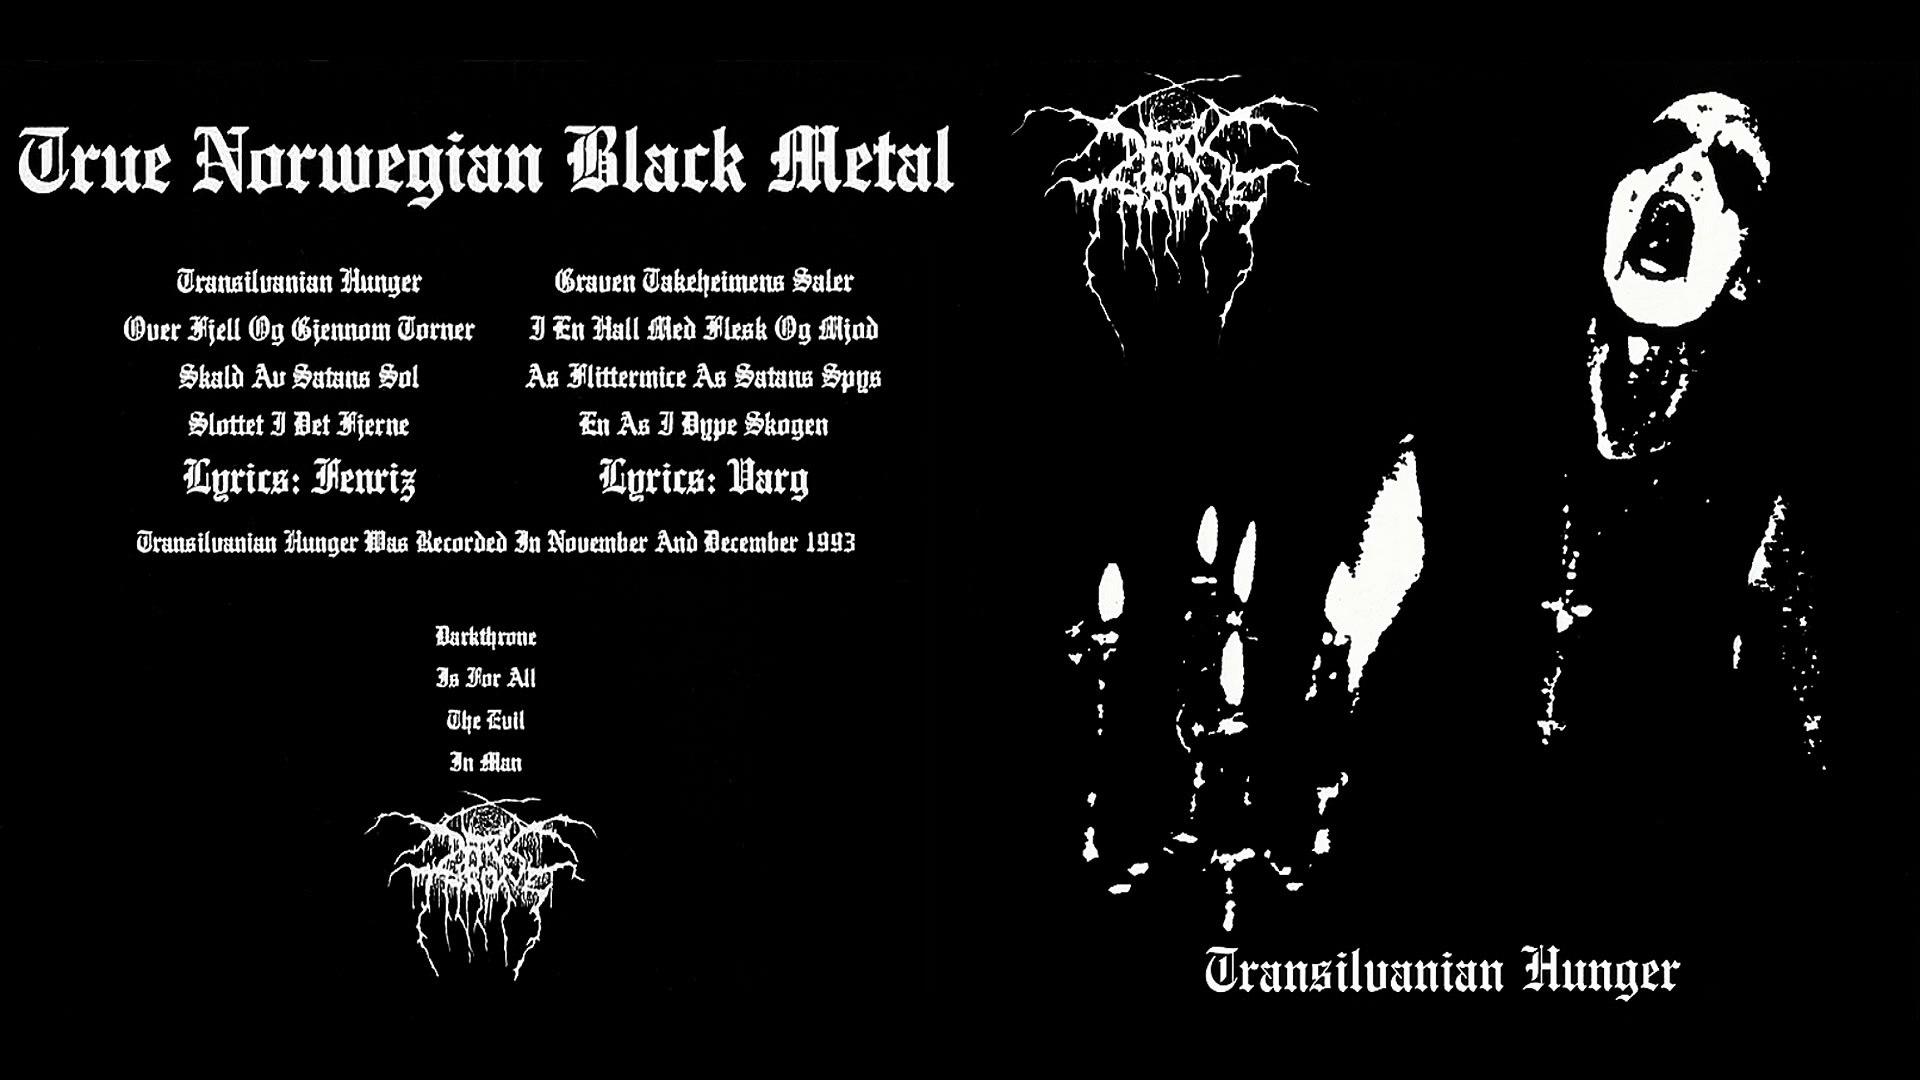 Darkthrone - Transilvanian Hunger (full album)